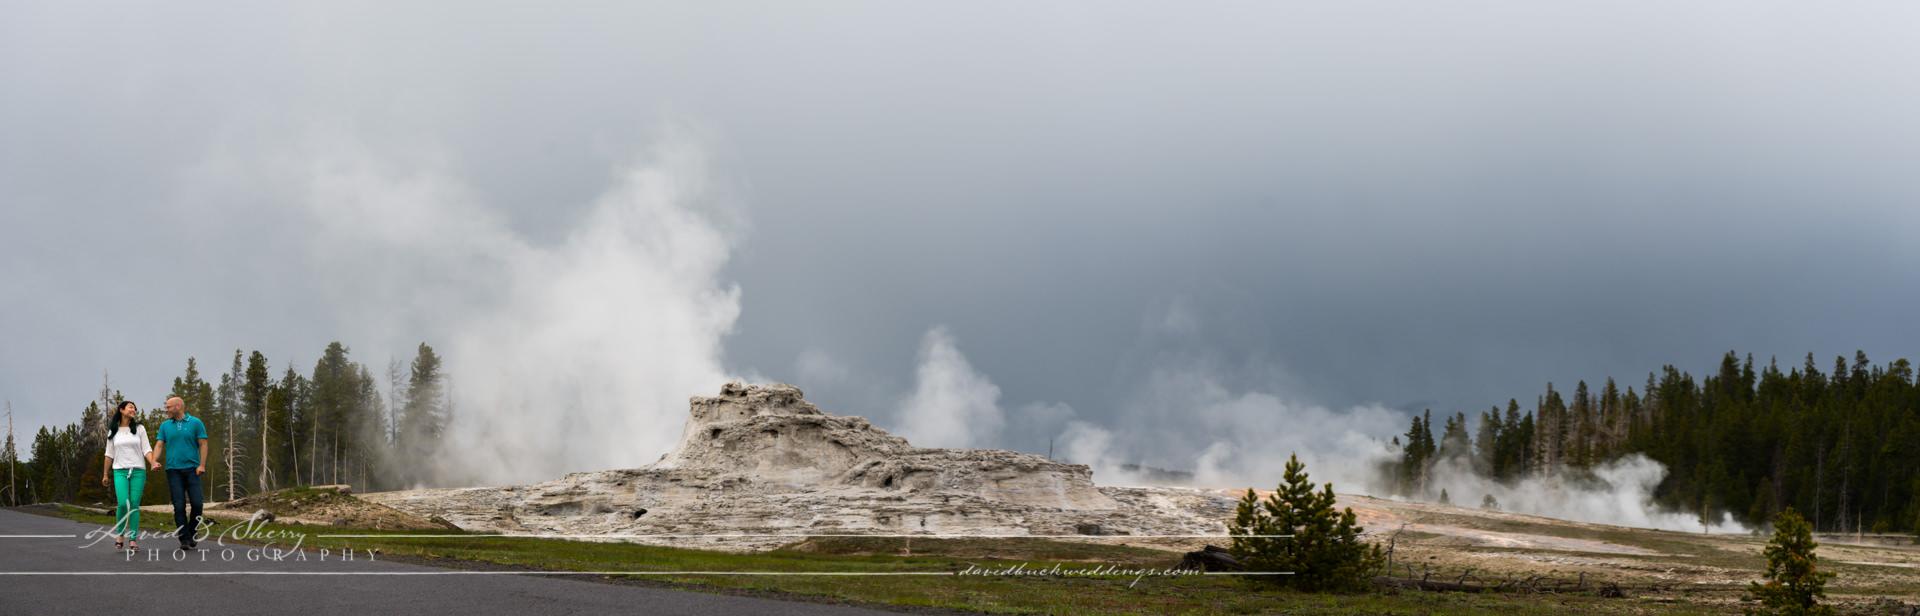 1 Yellowstone-Engagement-National-Park-009